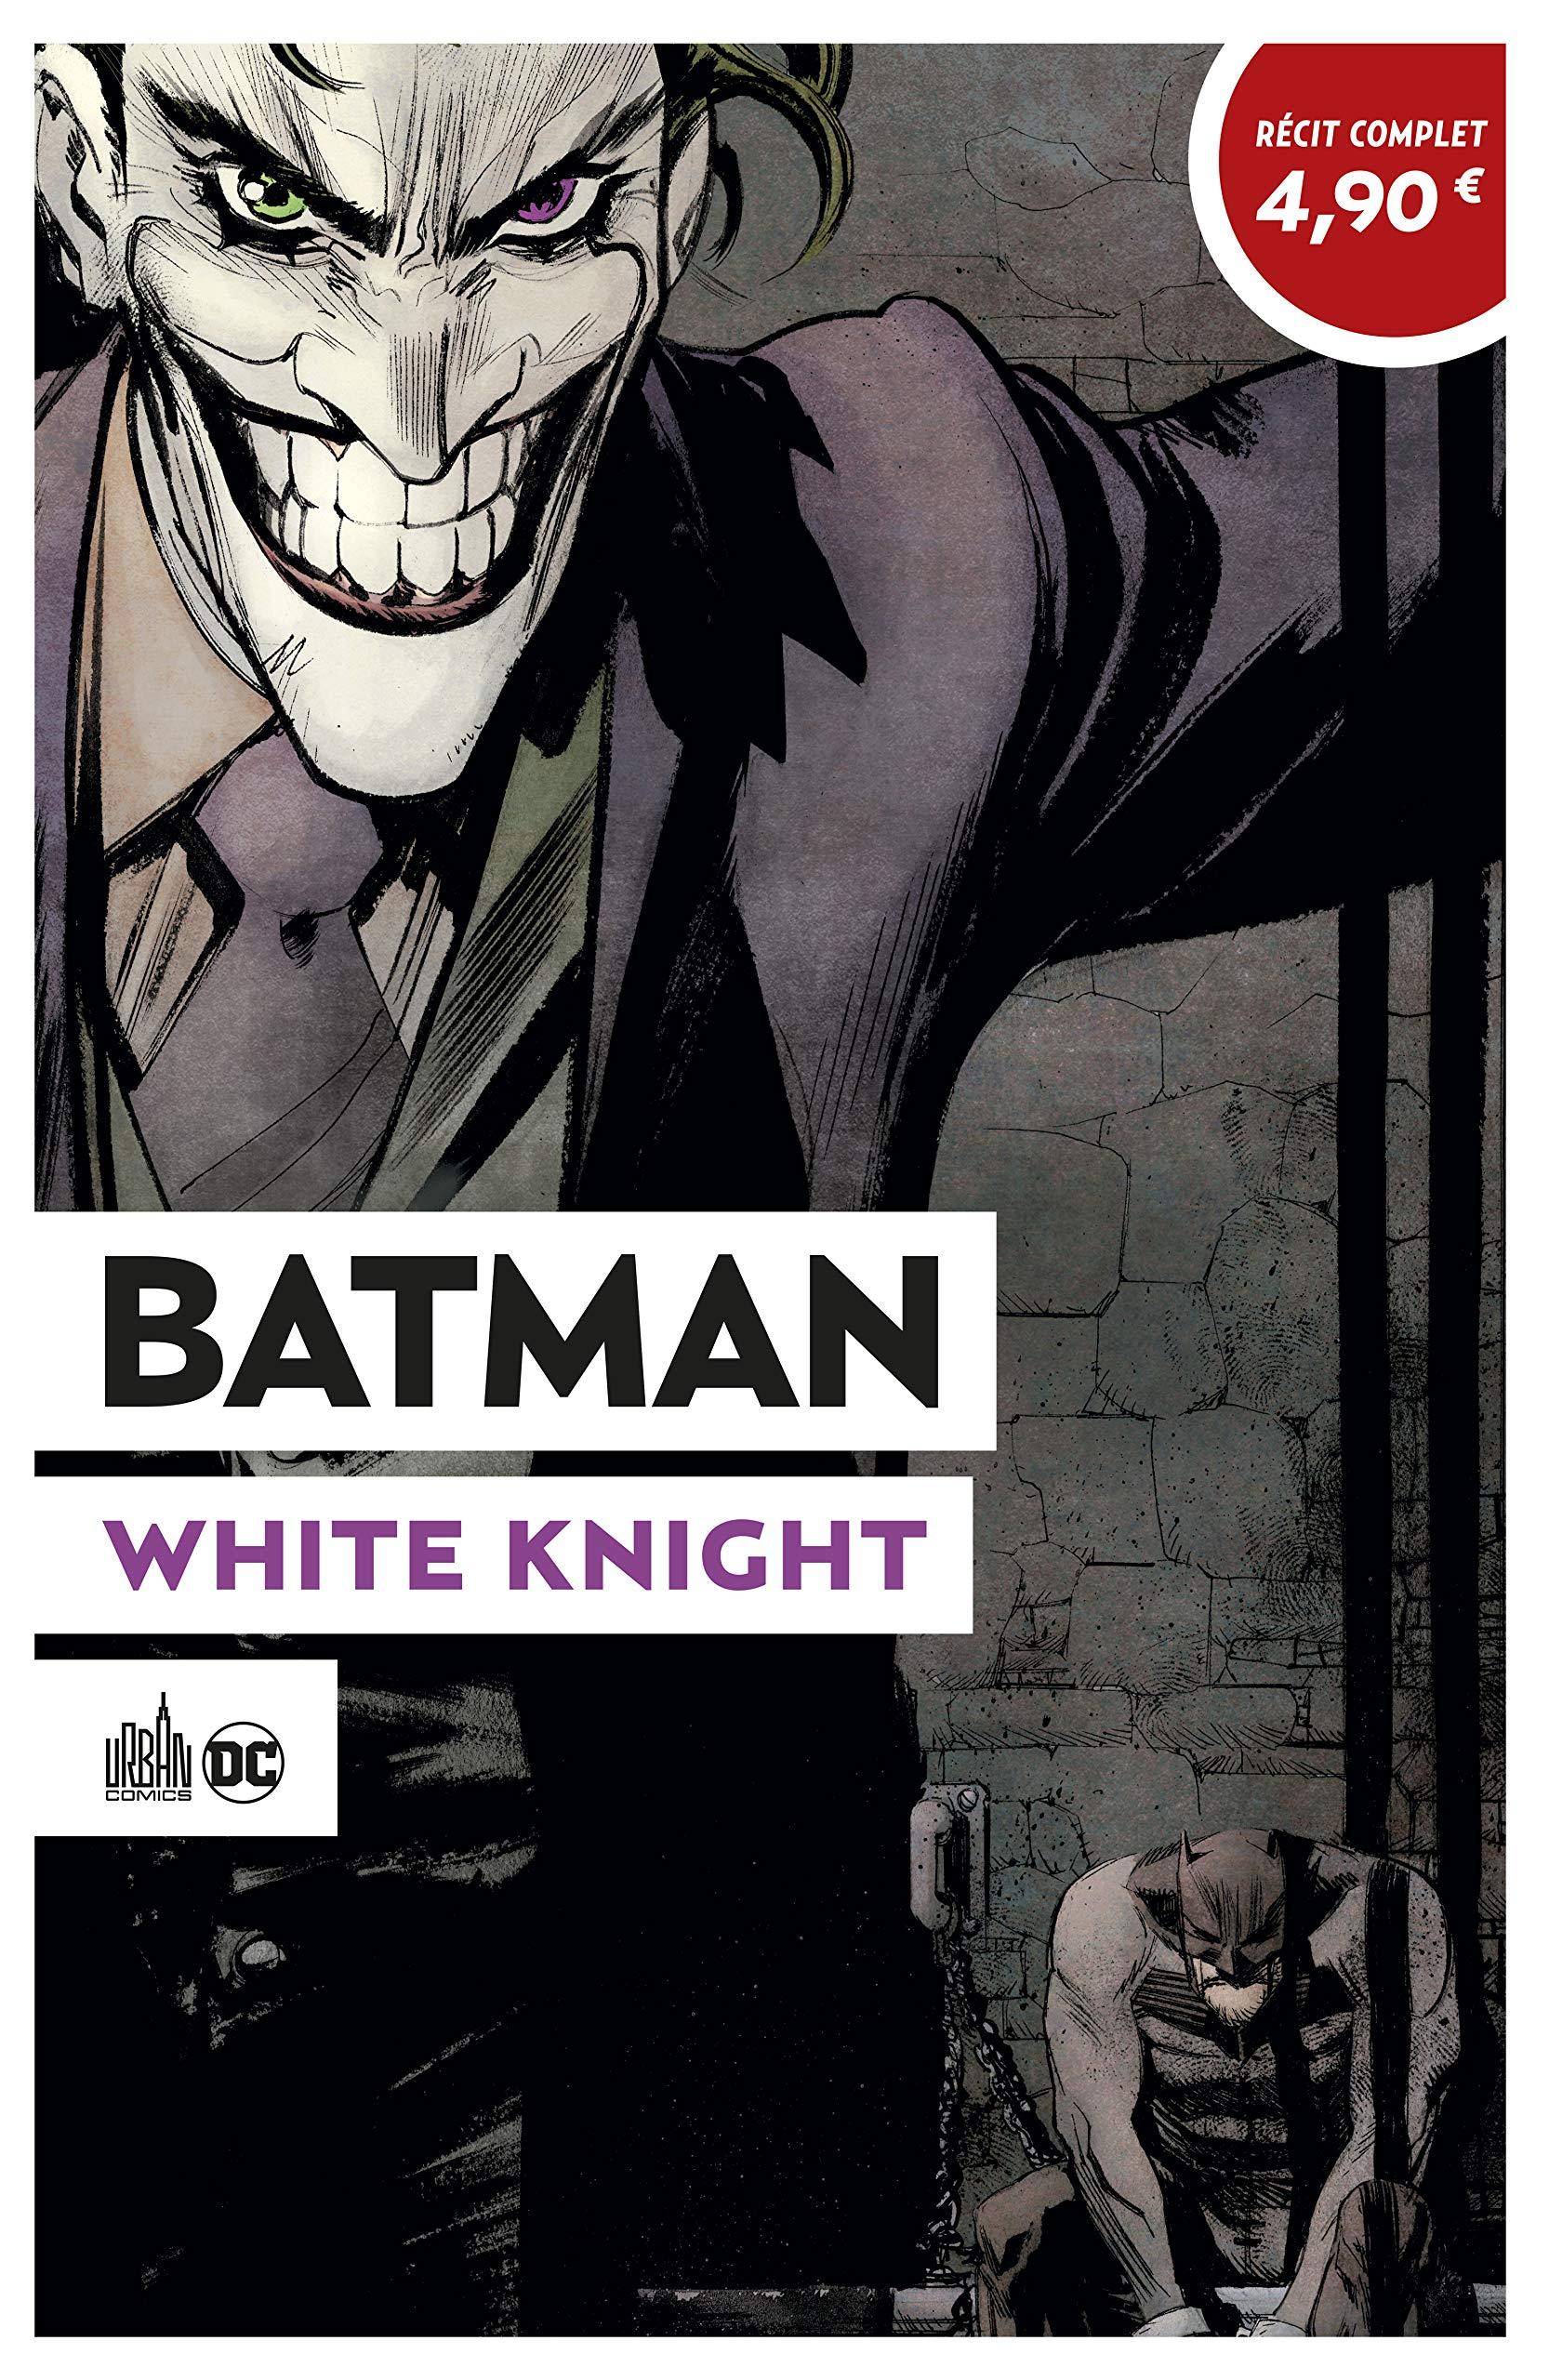 Batman White Knight by Sean Murphy